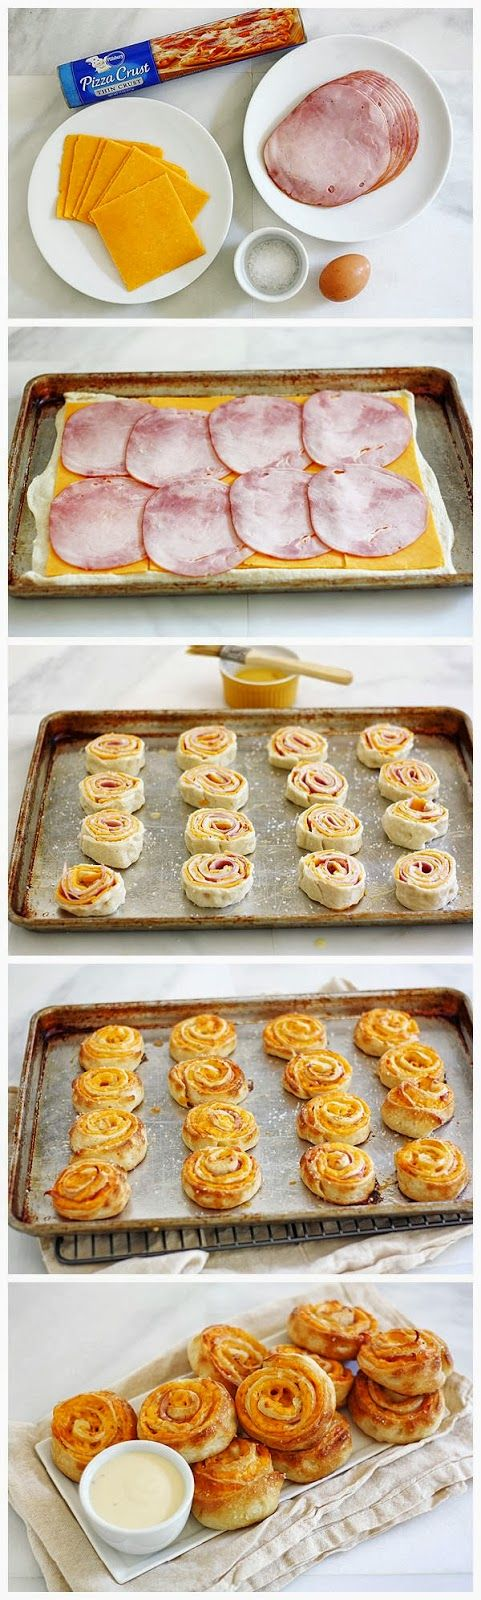 Ham & Cheese Pretzel Bites - Just whip up the dough, let it rise for 2 hours, shape the pretzels, let rise again for 30 minutes, then boil a...